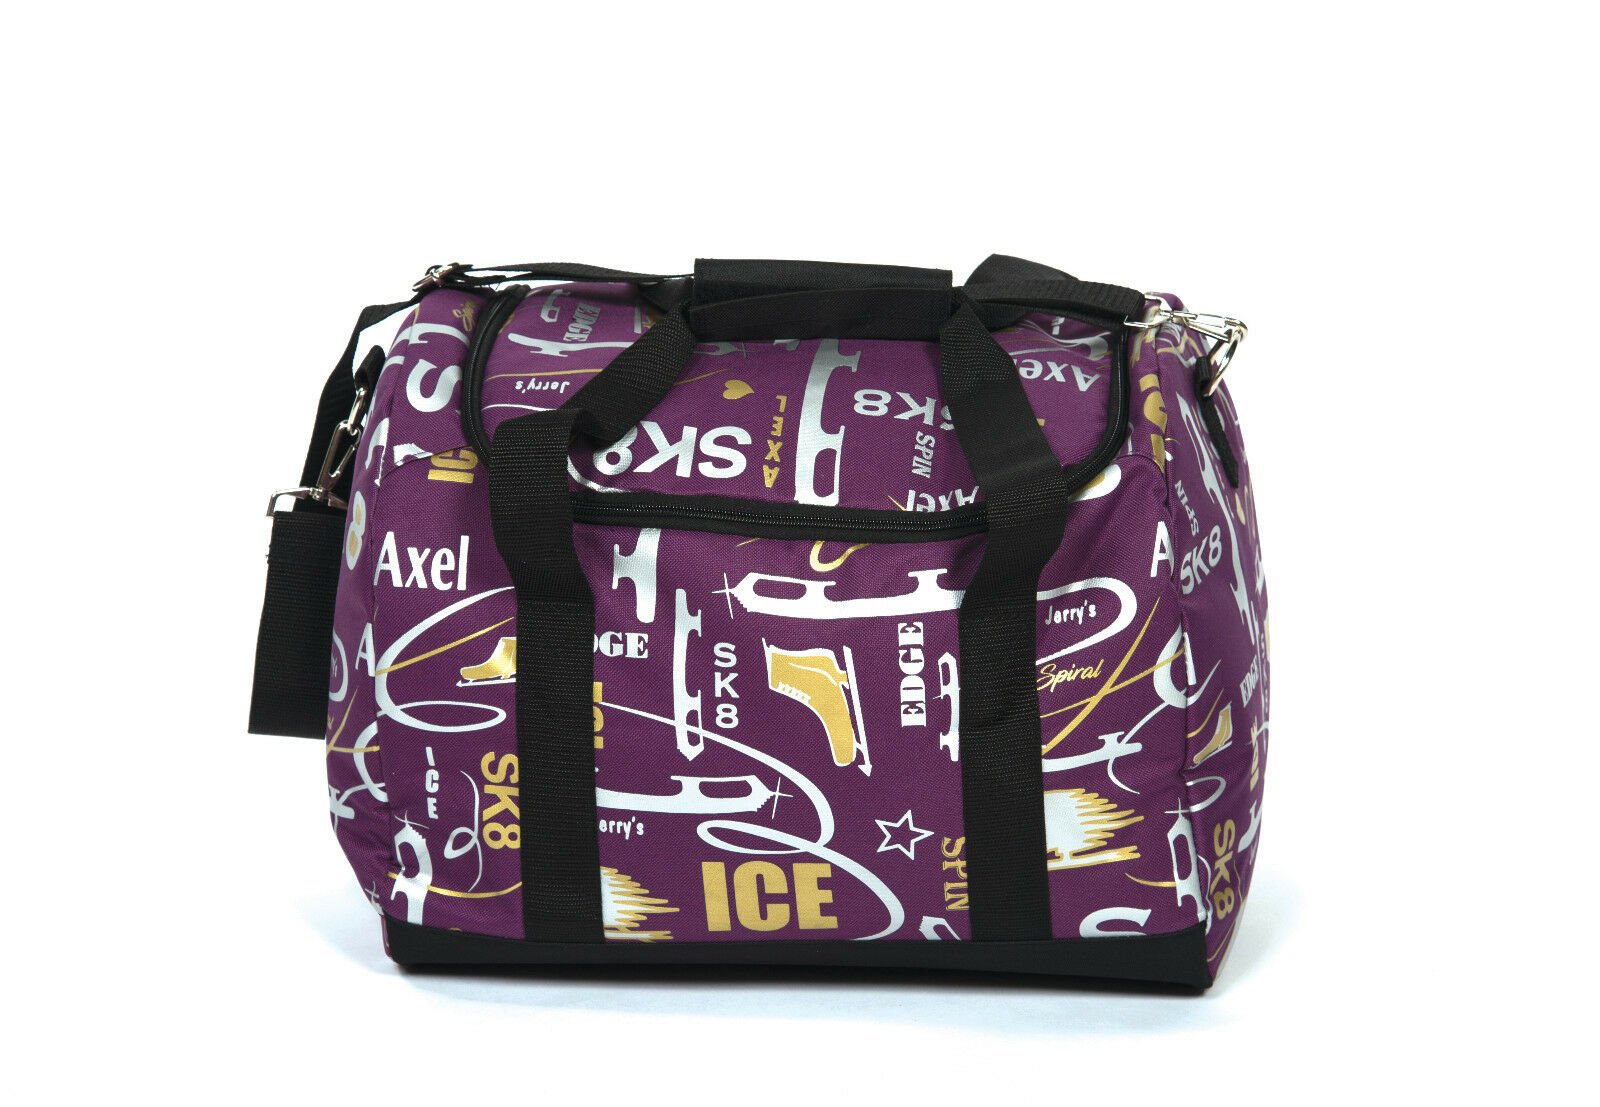 aab1e4faf70aa Figure Bags Bag Jerry s Purple Grafitti Carry All Skating 6090 ...